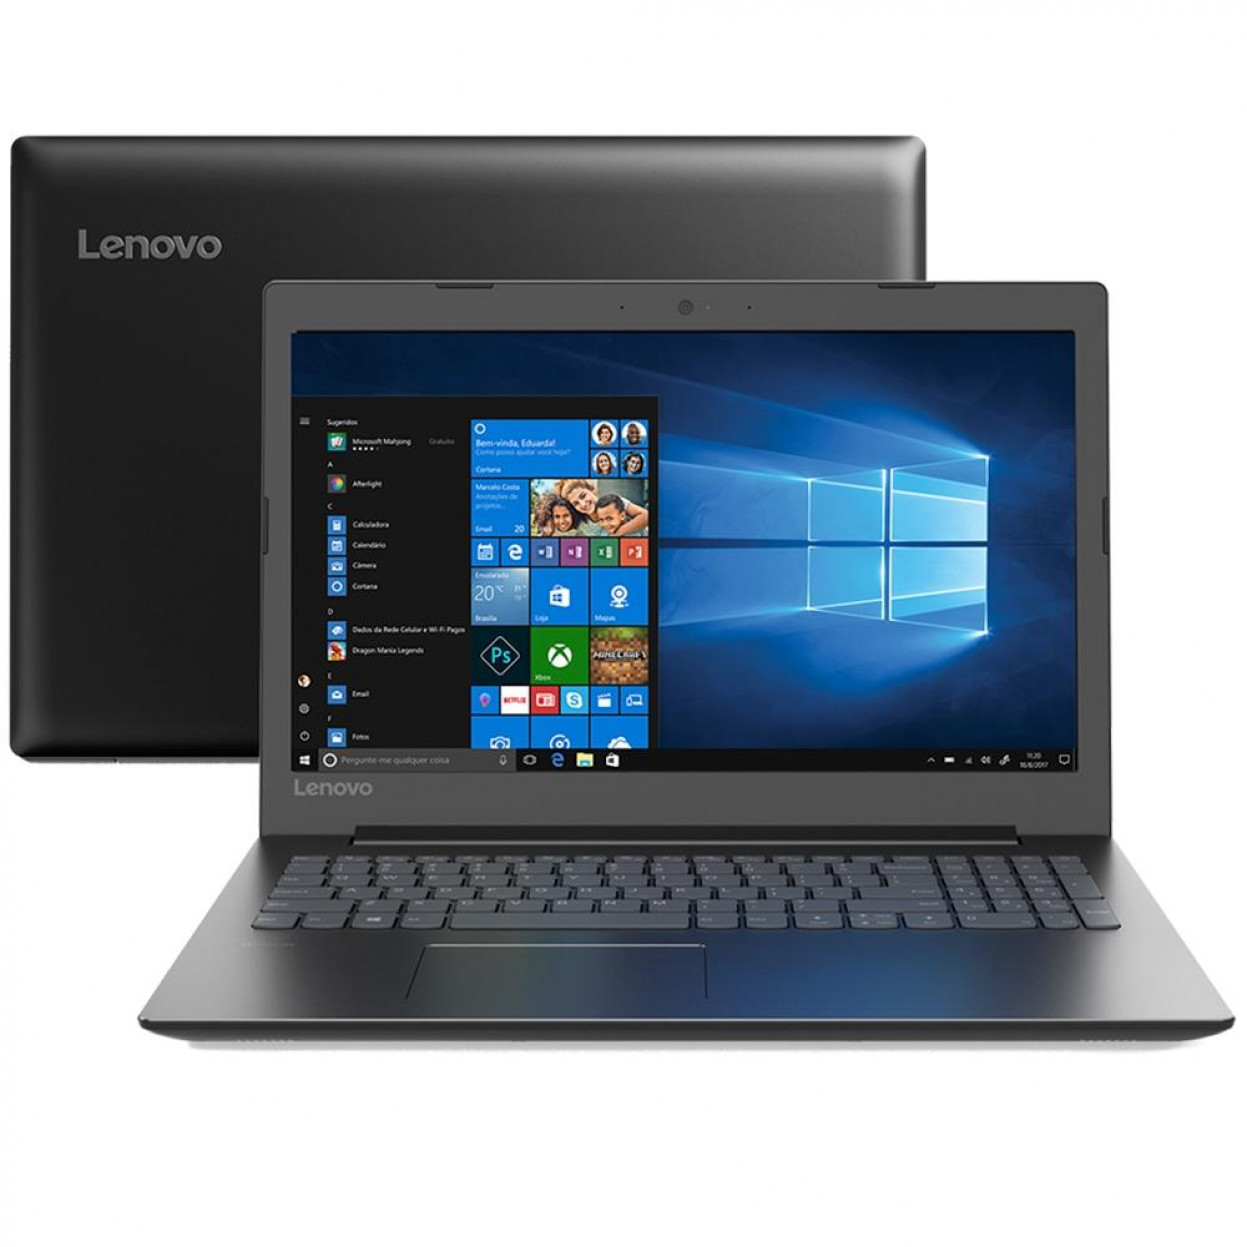 Notebook Lenovo B330 Core I5 8250u Memoria 4gb Ddr4 Ssd 240gb Tela 15.6' Fhd Windows 10 Home